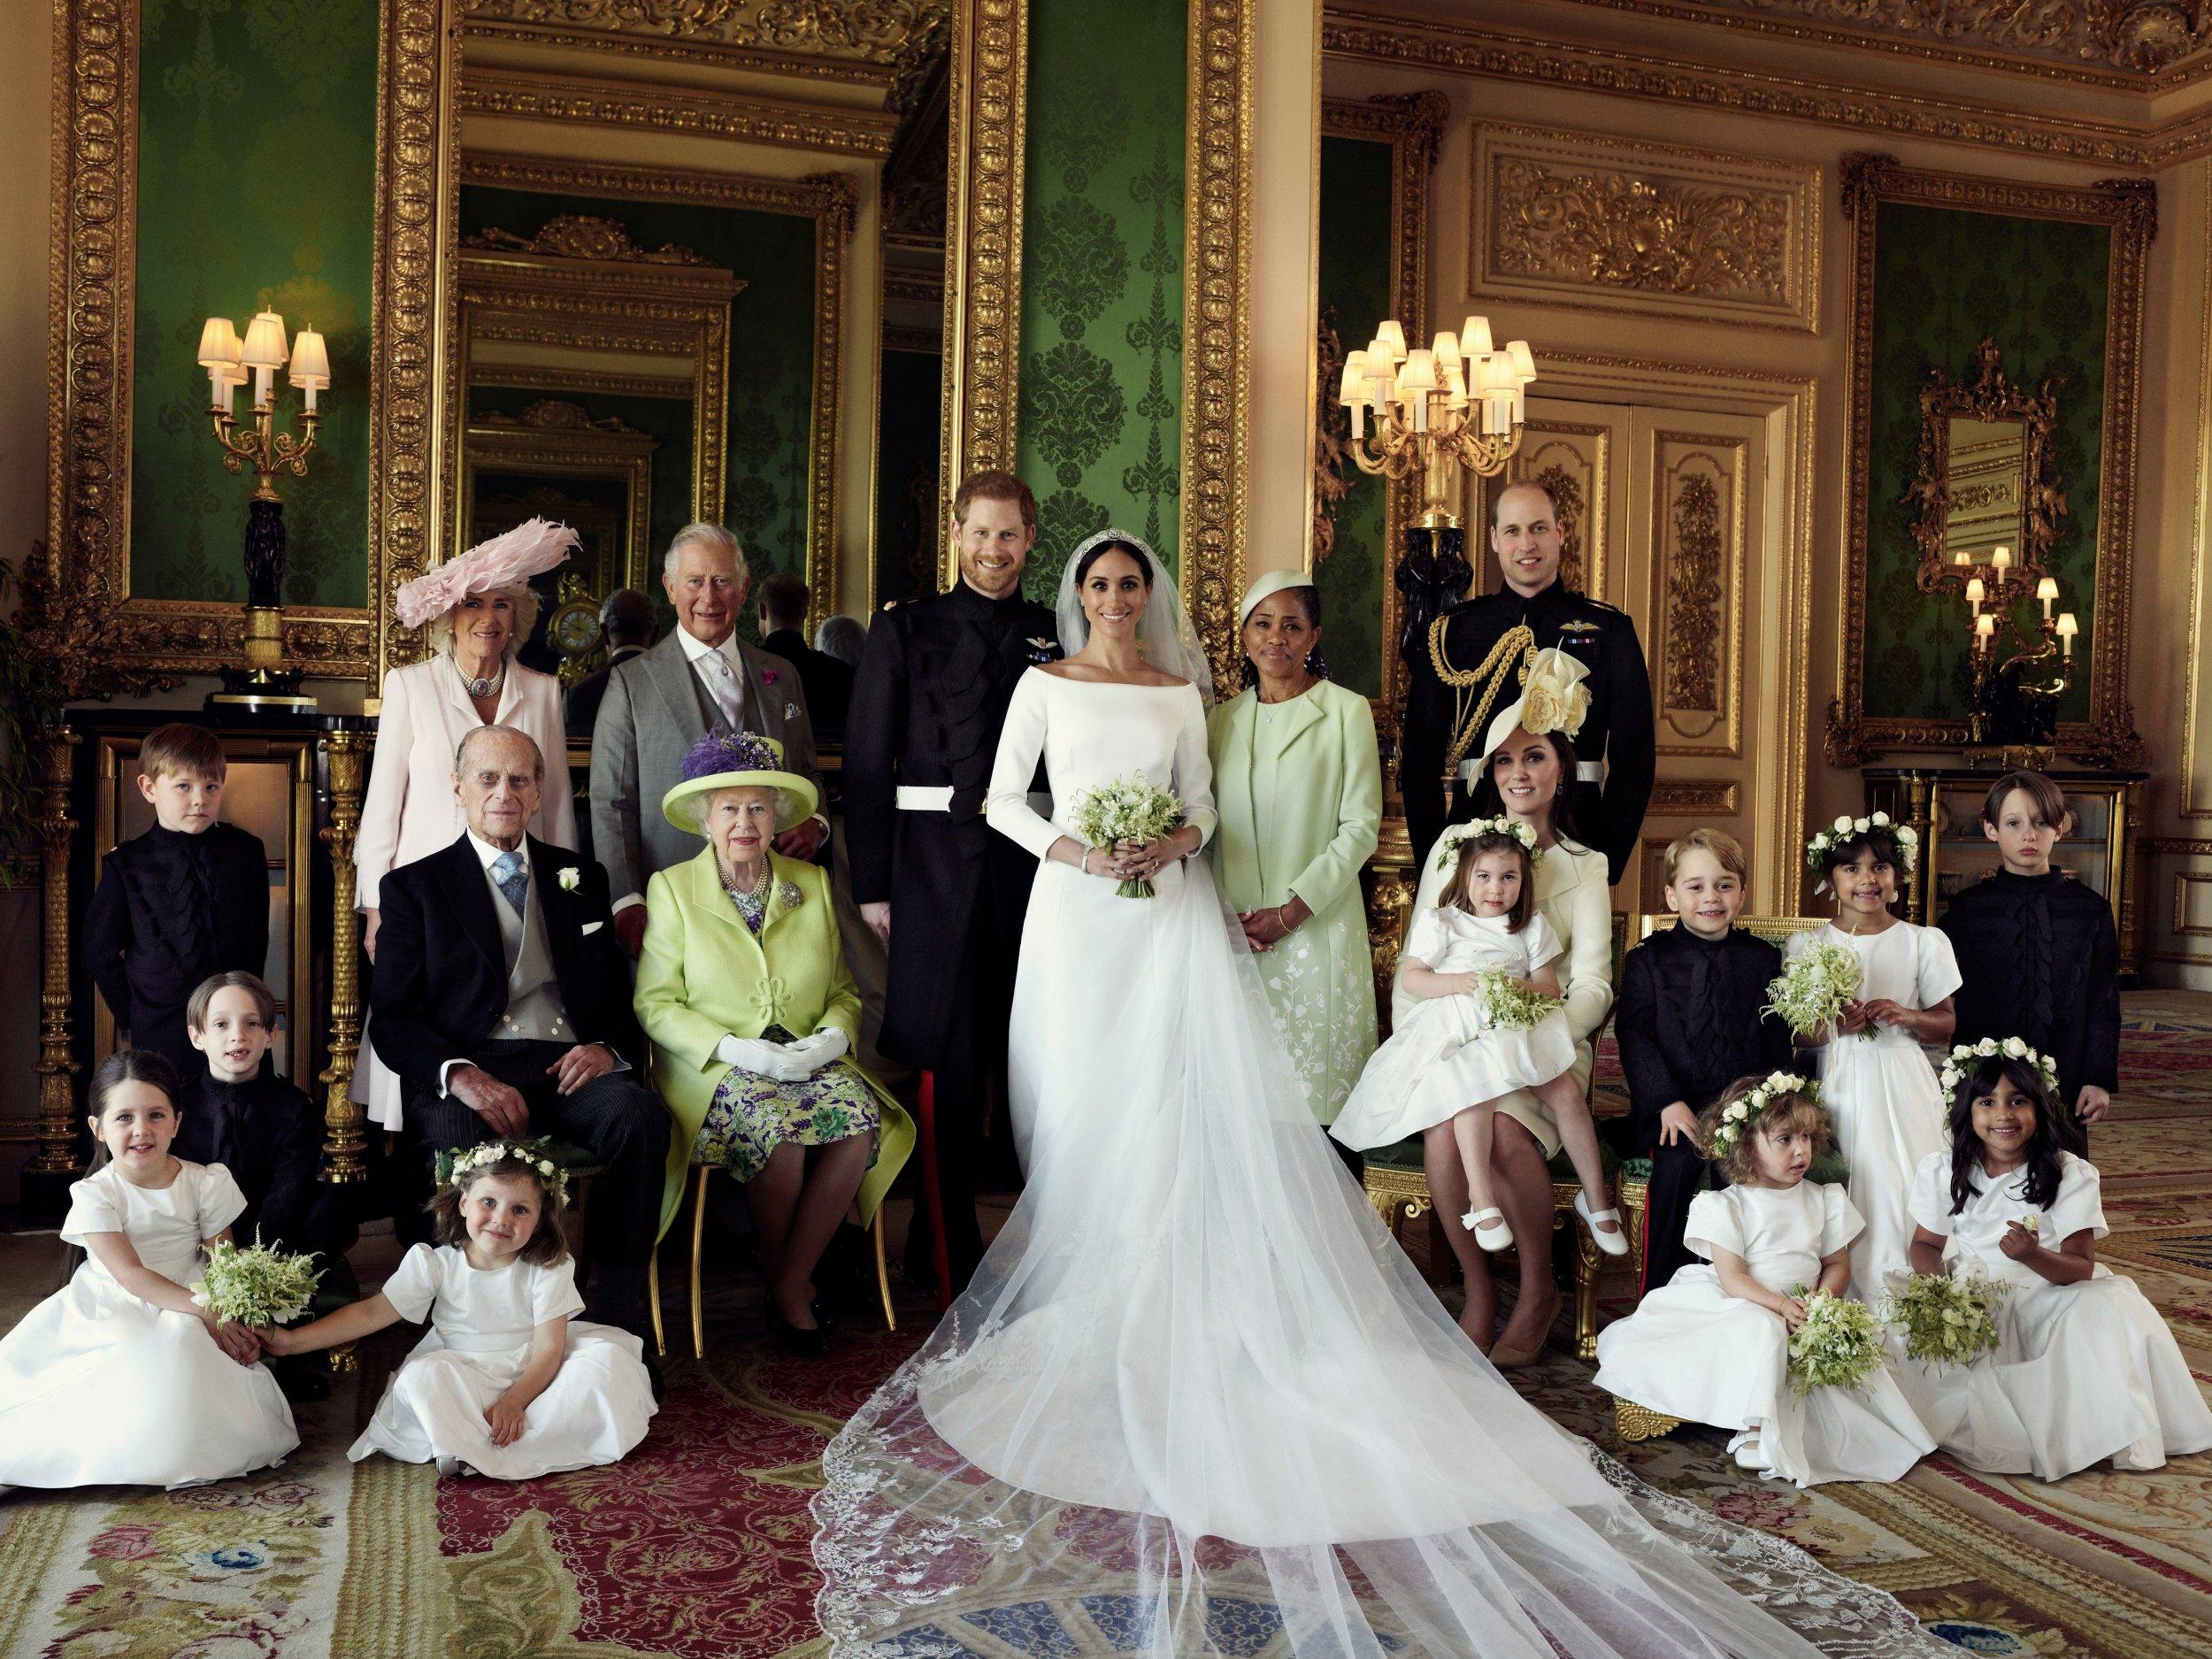 How To Buy Meghan Markle's Royal Wedding Dress